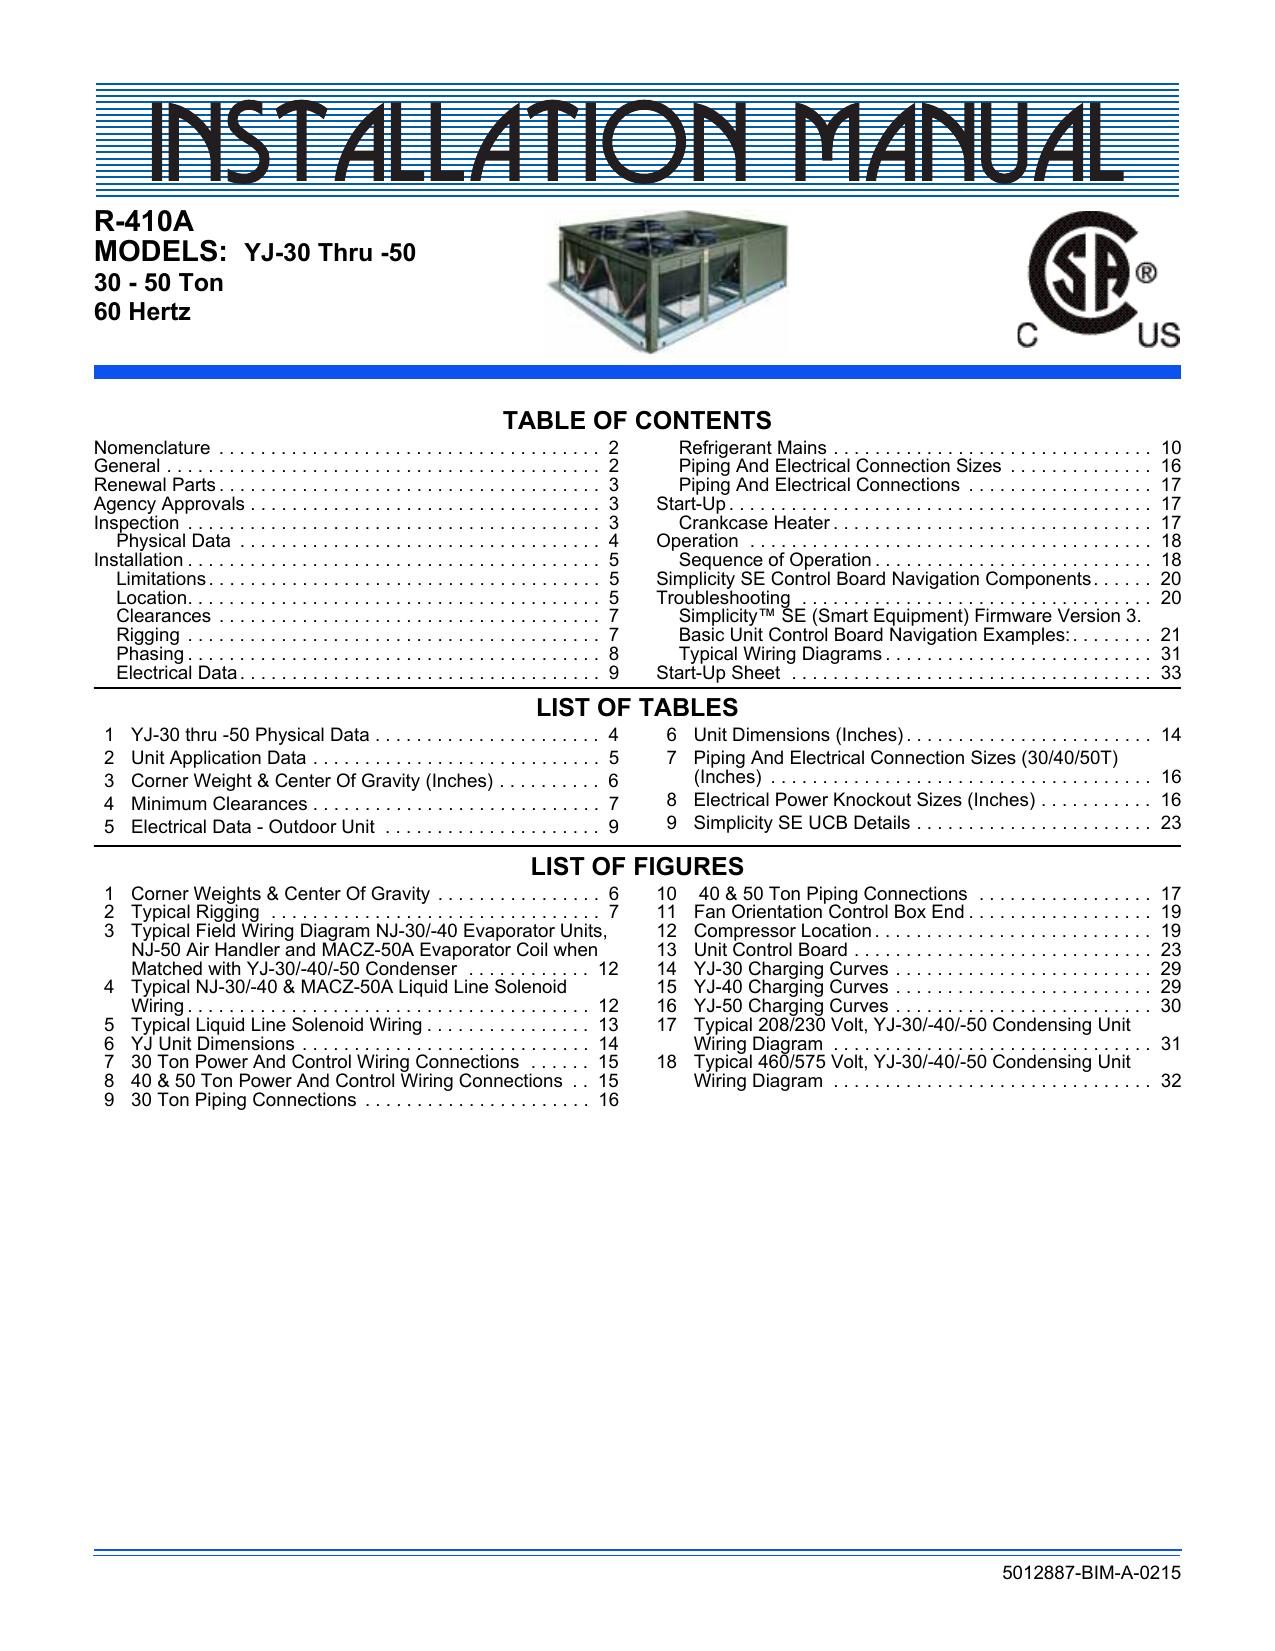 [DIAGRAM_5UK]  User Manual - Fraser-Johnston® Commercial HVAC Systems | Manualzz | Fraser Johnston Furnace Wiring Diagram |  | manualzz